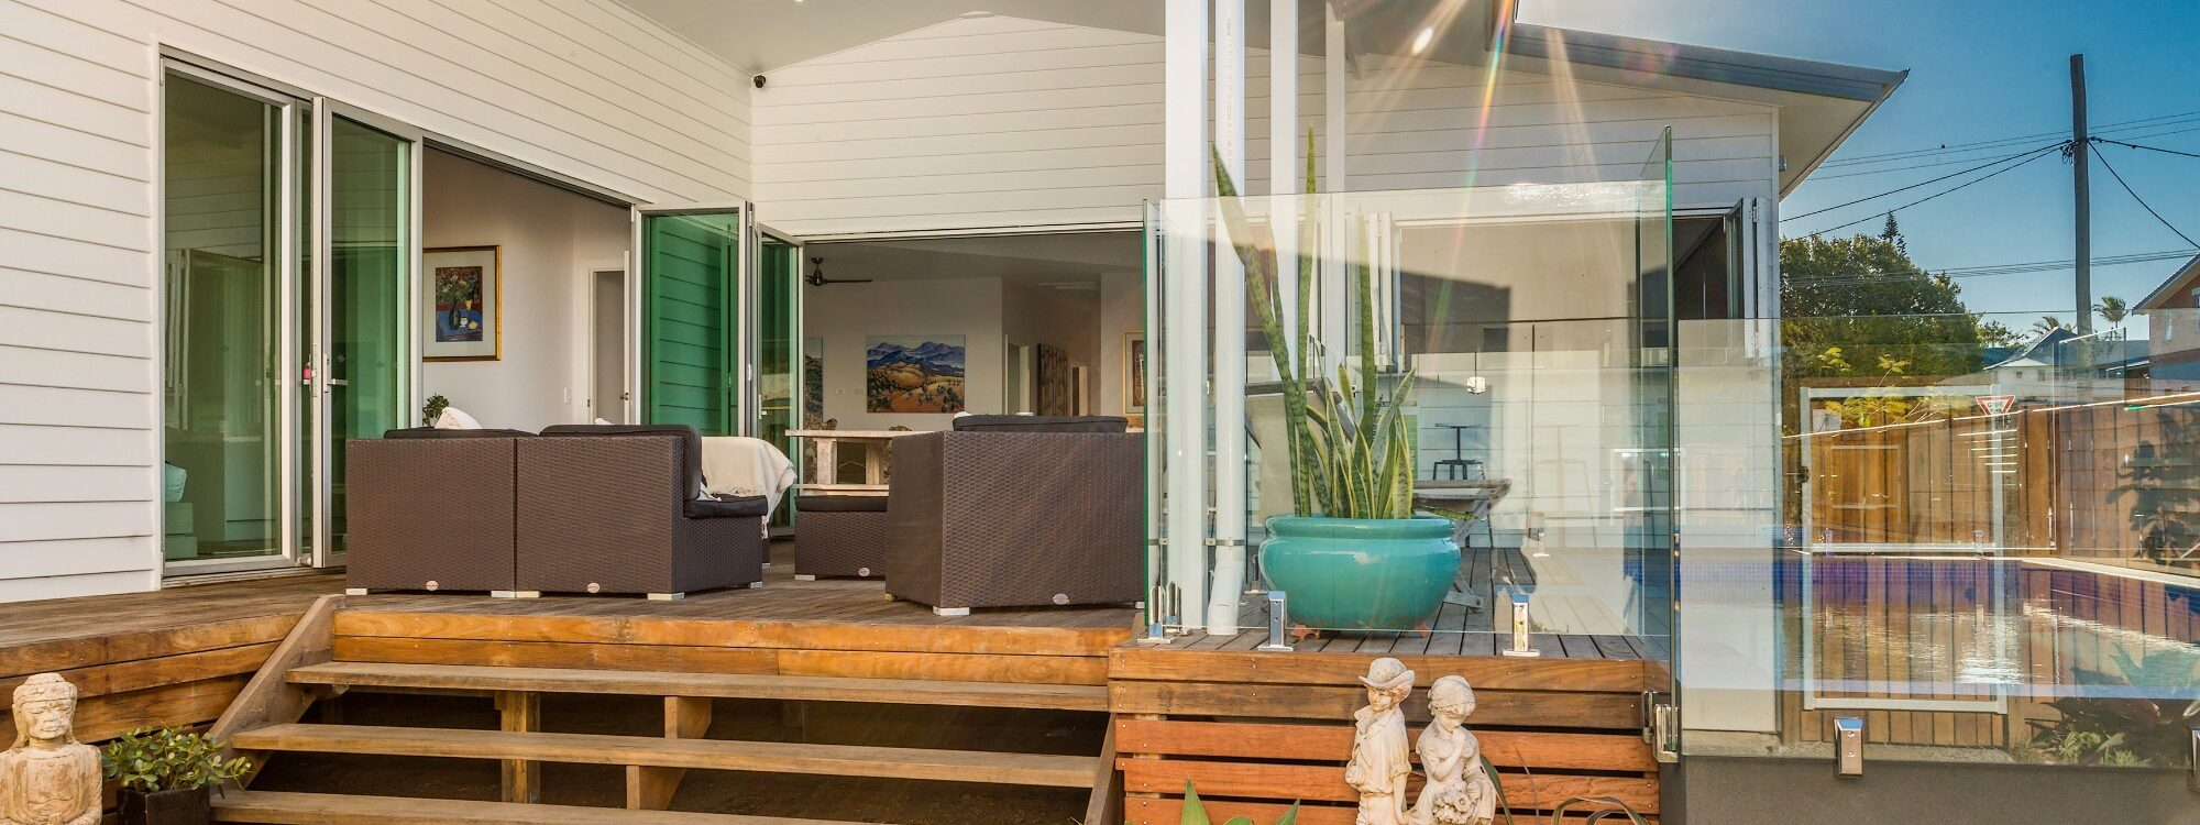 Aditi - back deck area